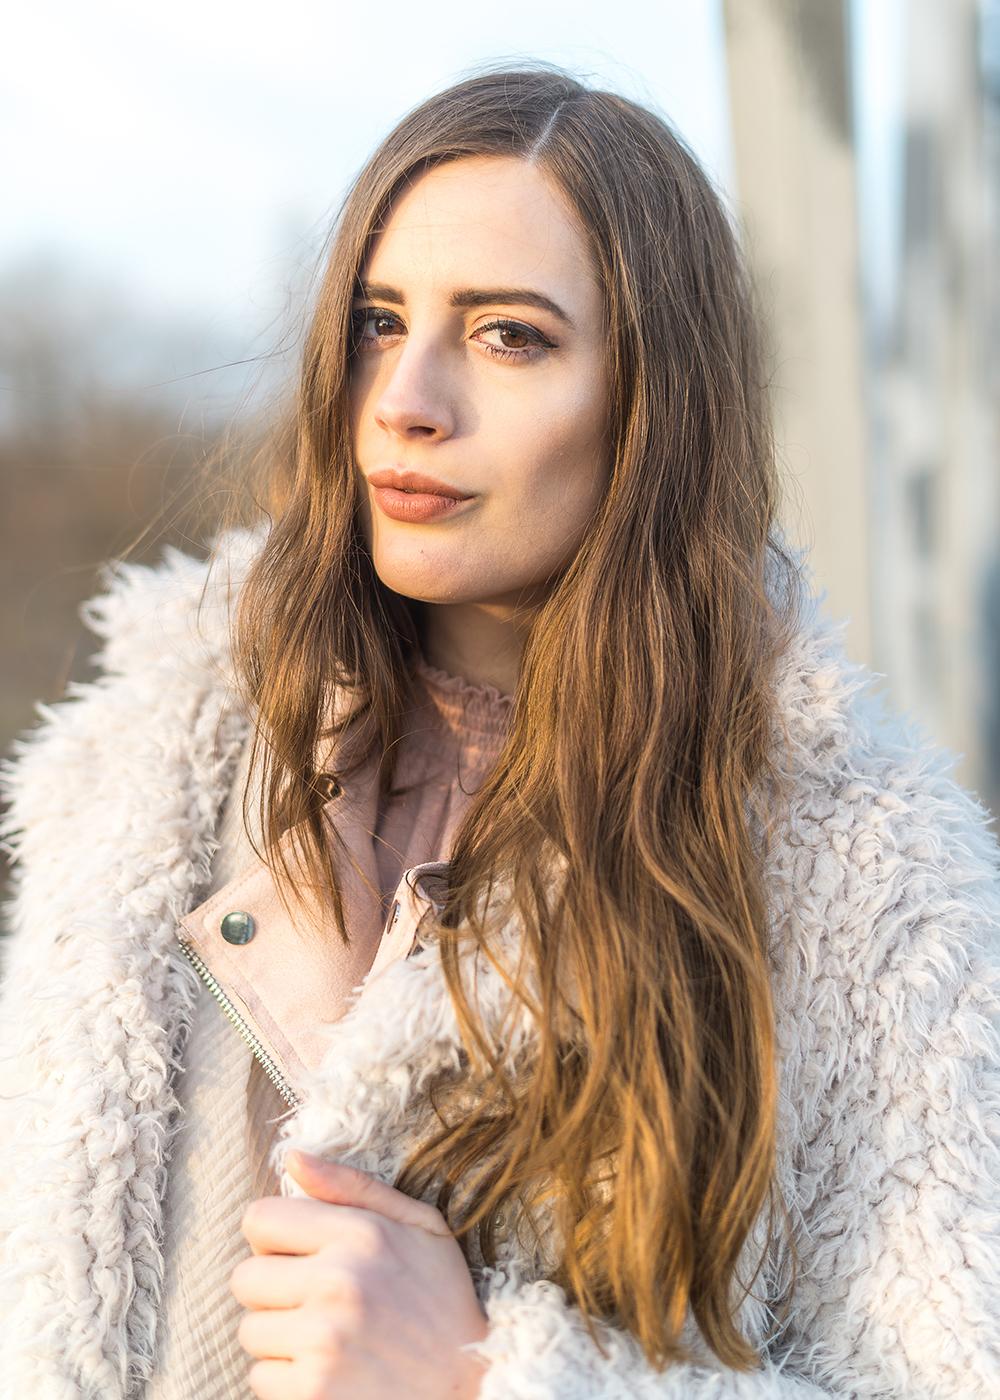 Erste Hilfe bei gereizter Haut-HiPP SOS Wundschutz-Beautyblog-andysparkles